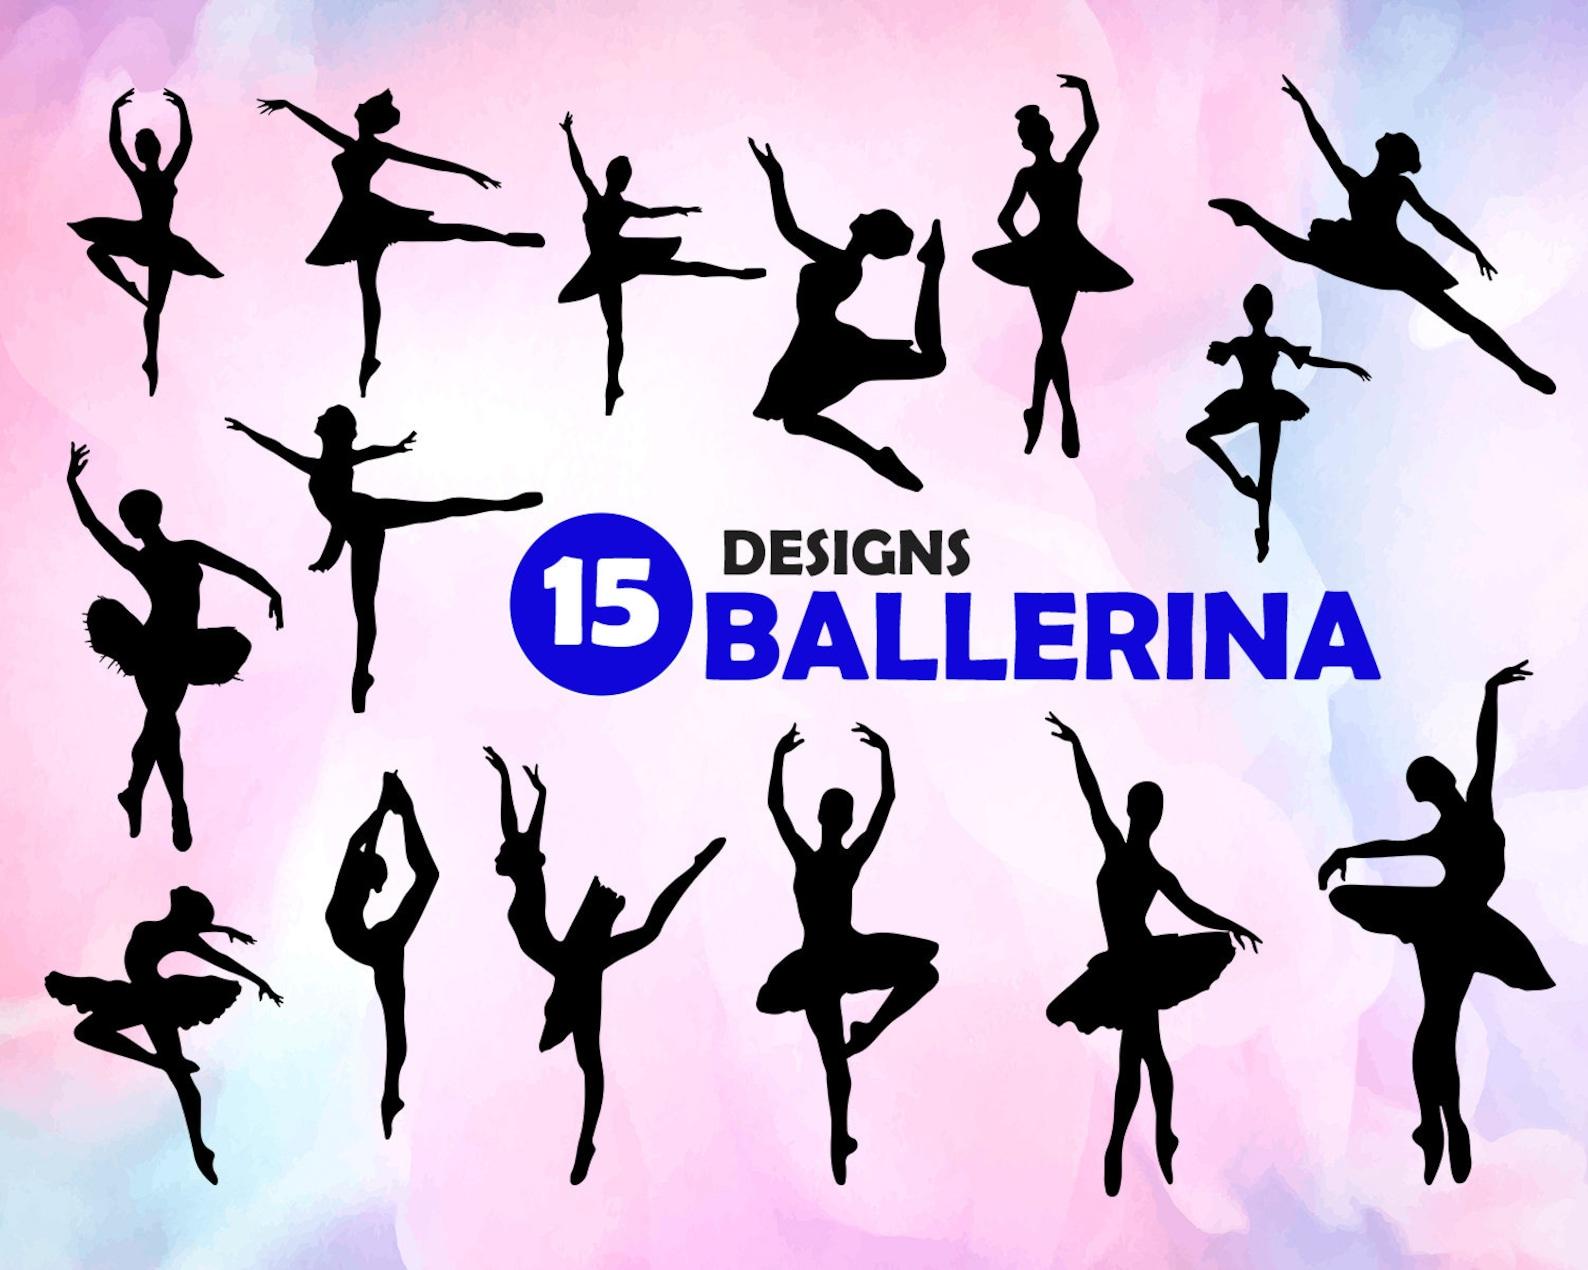 ballerina svg, ballet svg, dancer svg, ballerina silhouette, ballerina clipart, ballerina cut file, ballerina, ballerina dxf, ba